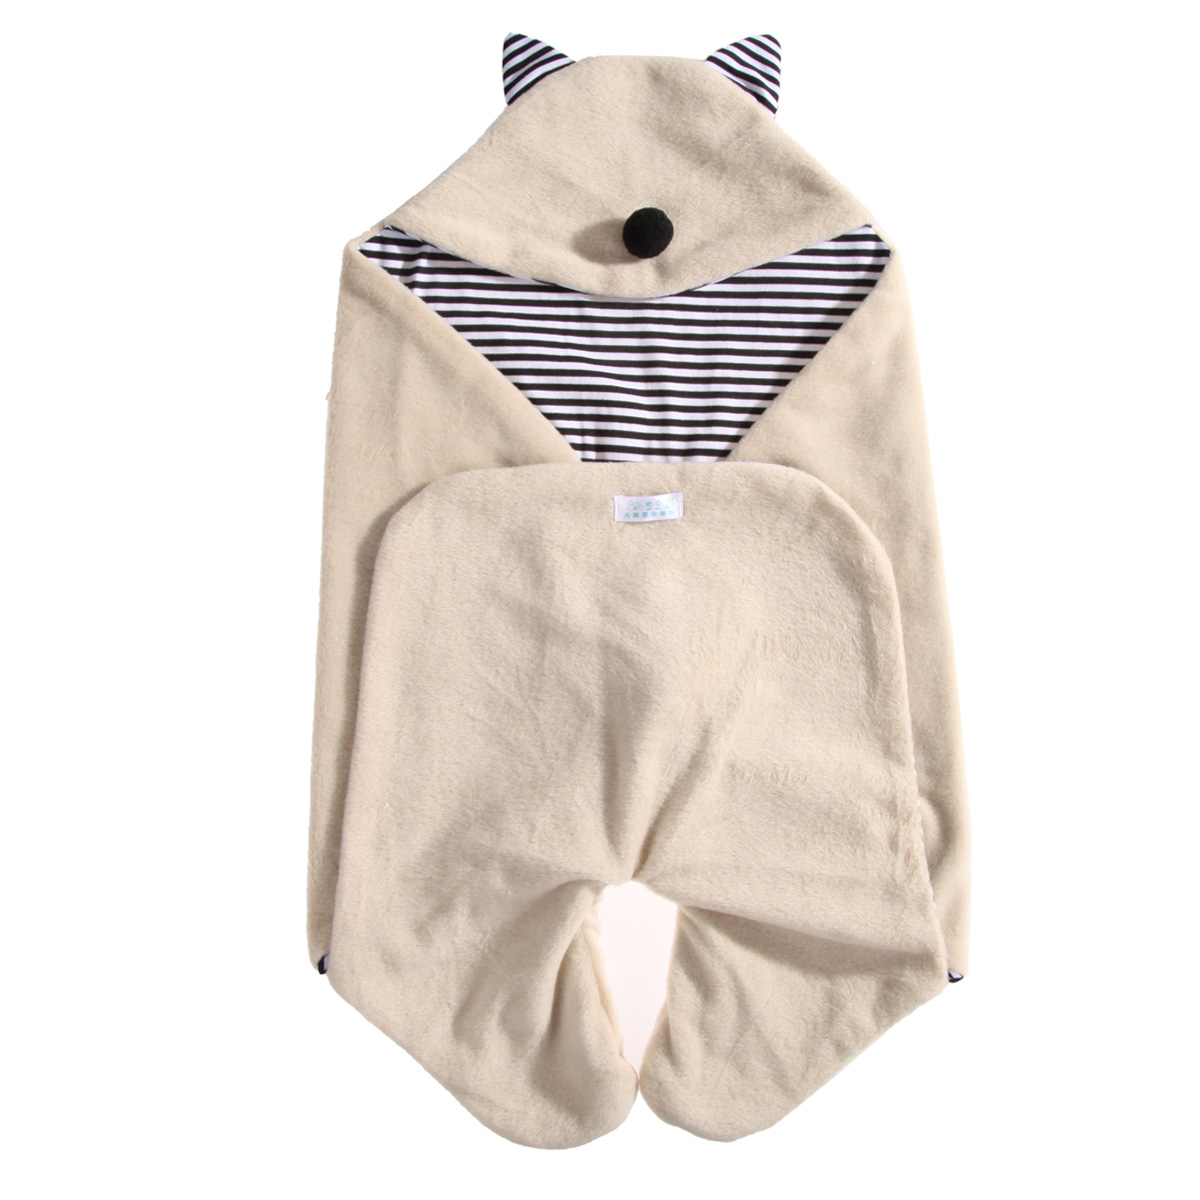 New Born Baby Toddler <font><b>Sleeping</b></font> Bag Sleepsack Stroller Wrap Newborn Baby Blanket Swaddle Quilt Blanket & Swaddling